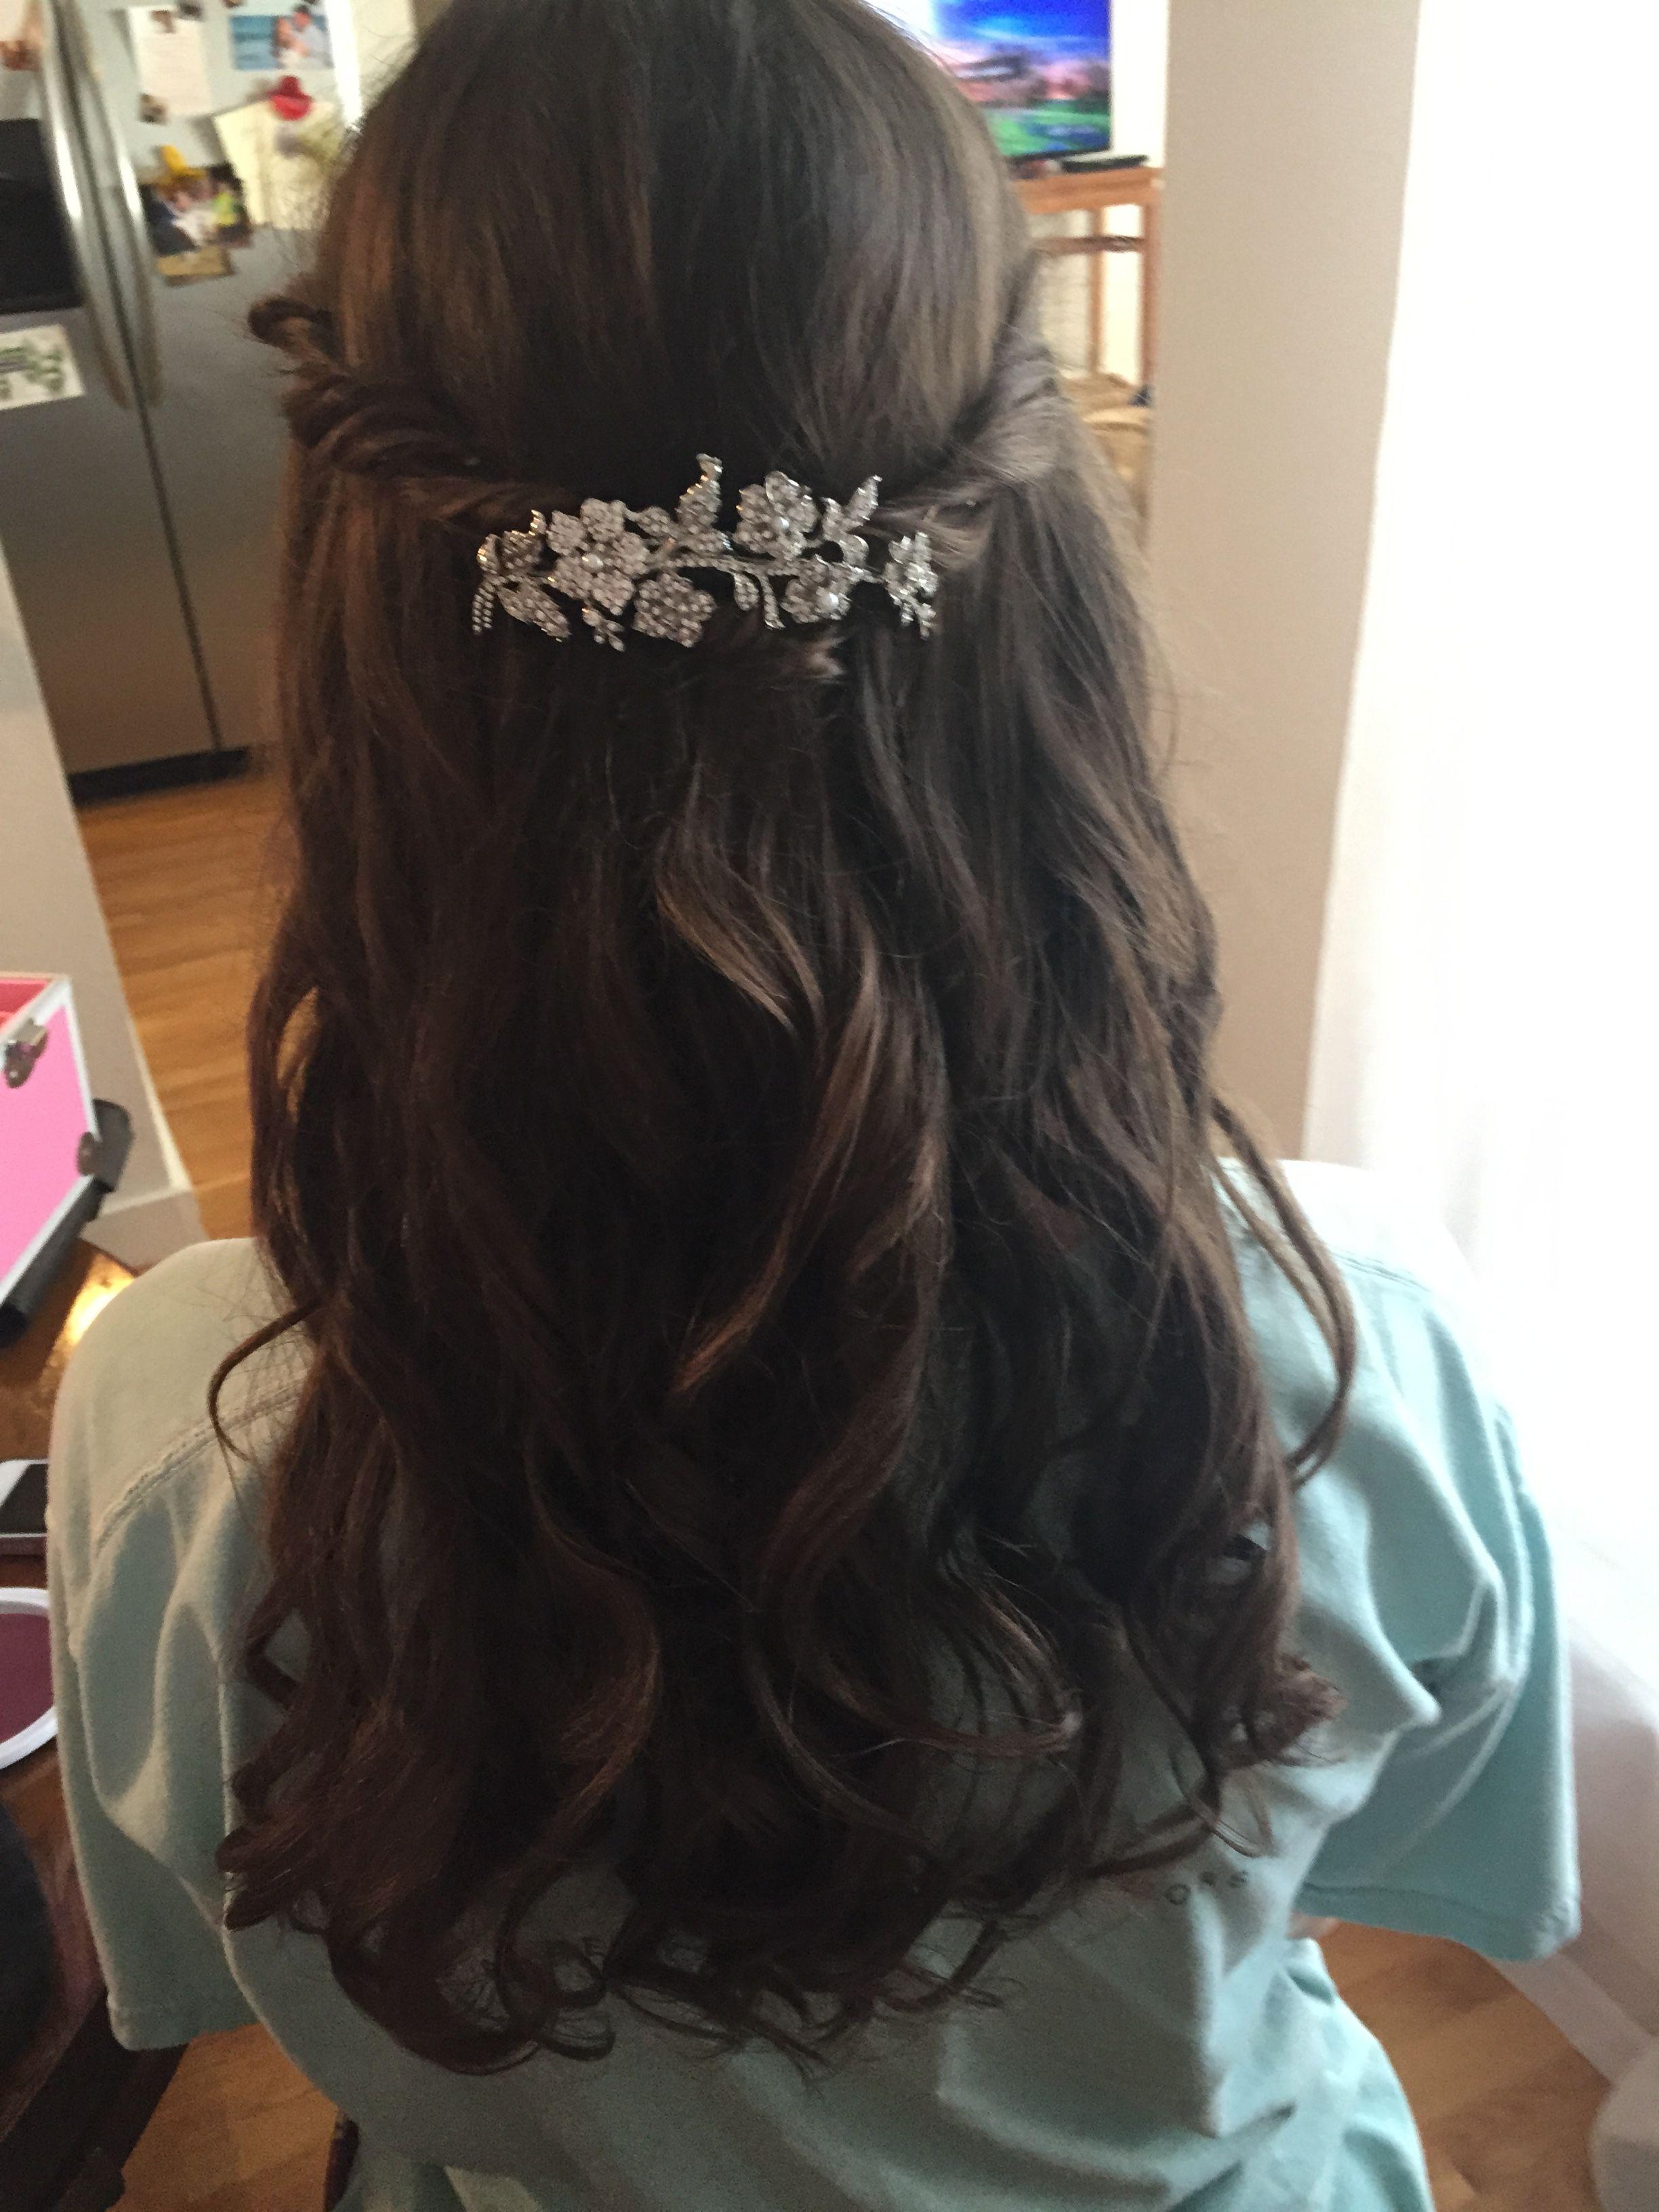 Hair styles image by Pratibha Jhalani on Wedding hairstyles